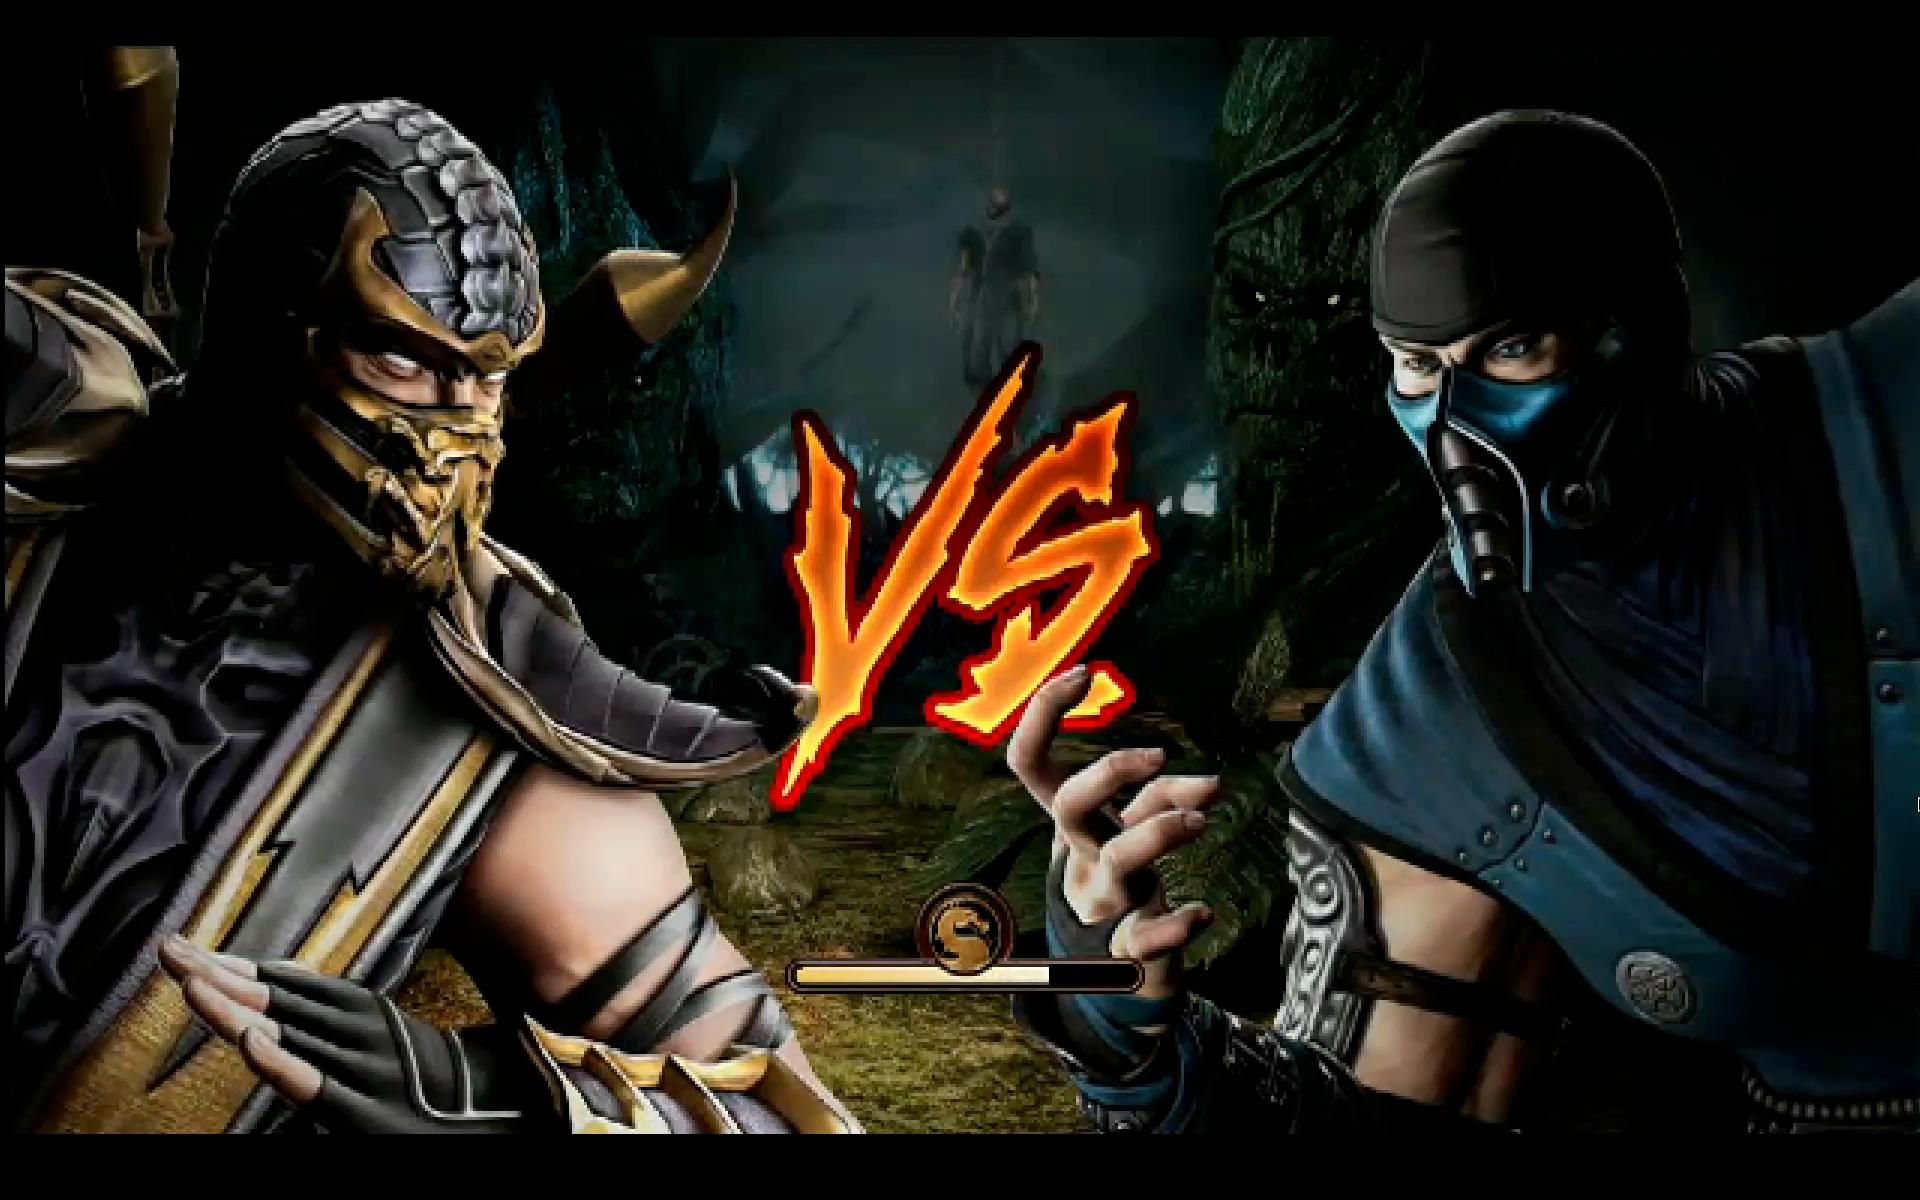 Nuevas imagenes de Mortal Kombat [Screenshots]